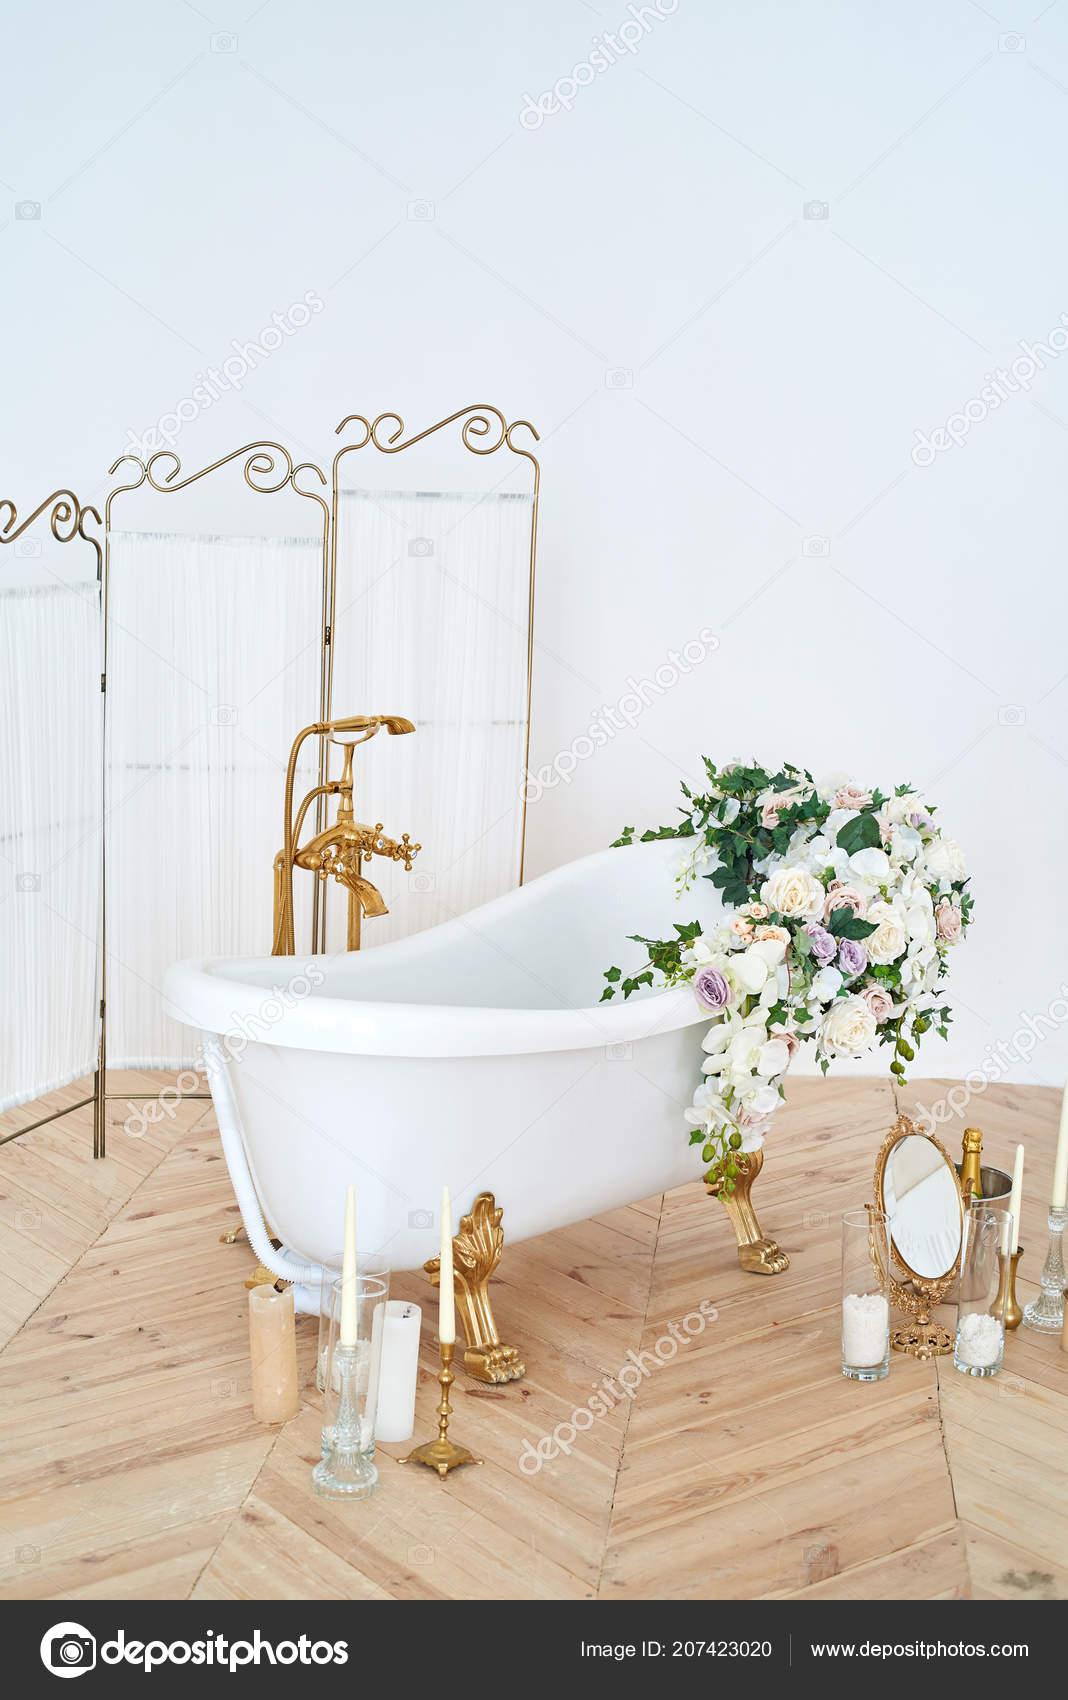 Beautiful Luxury Vintage Empty Bathtub Lush Floral